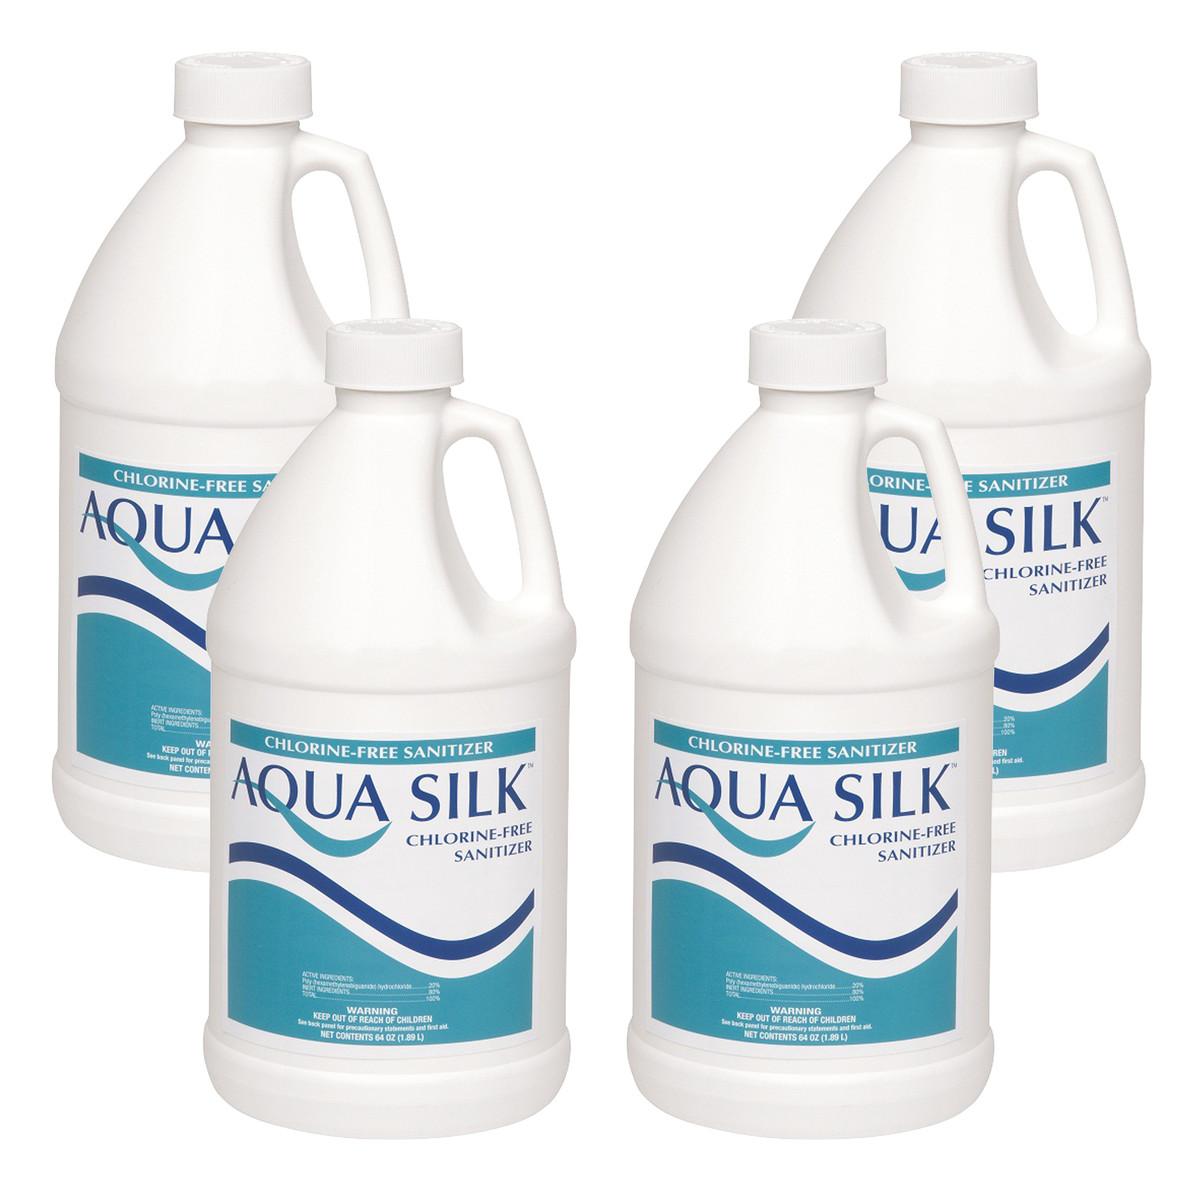 Aqua Silk 4 X 1 2 Gallon Chlorine Free Sanitizer